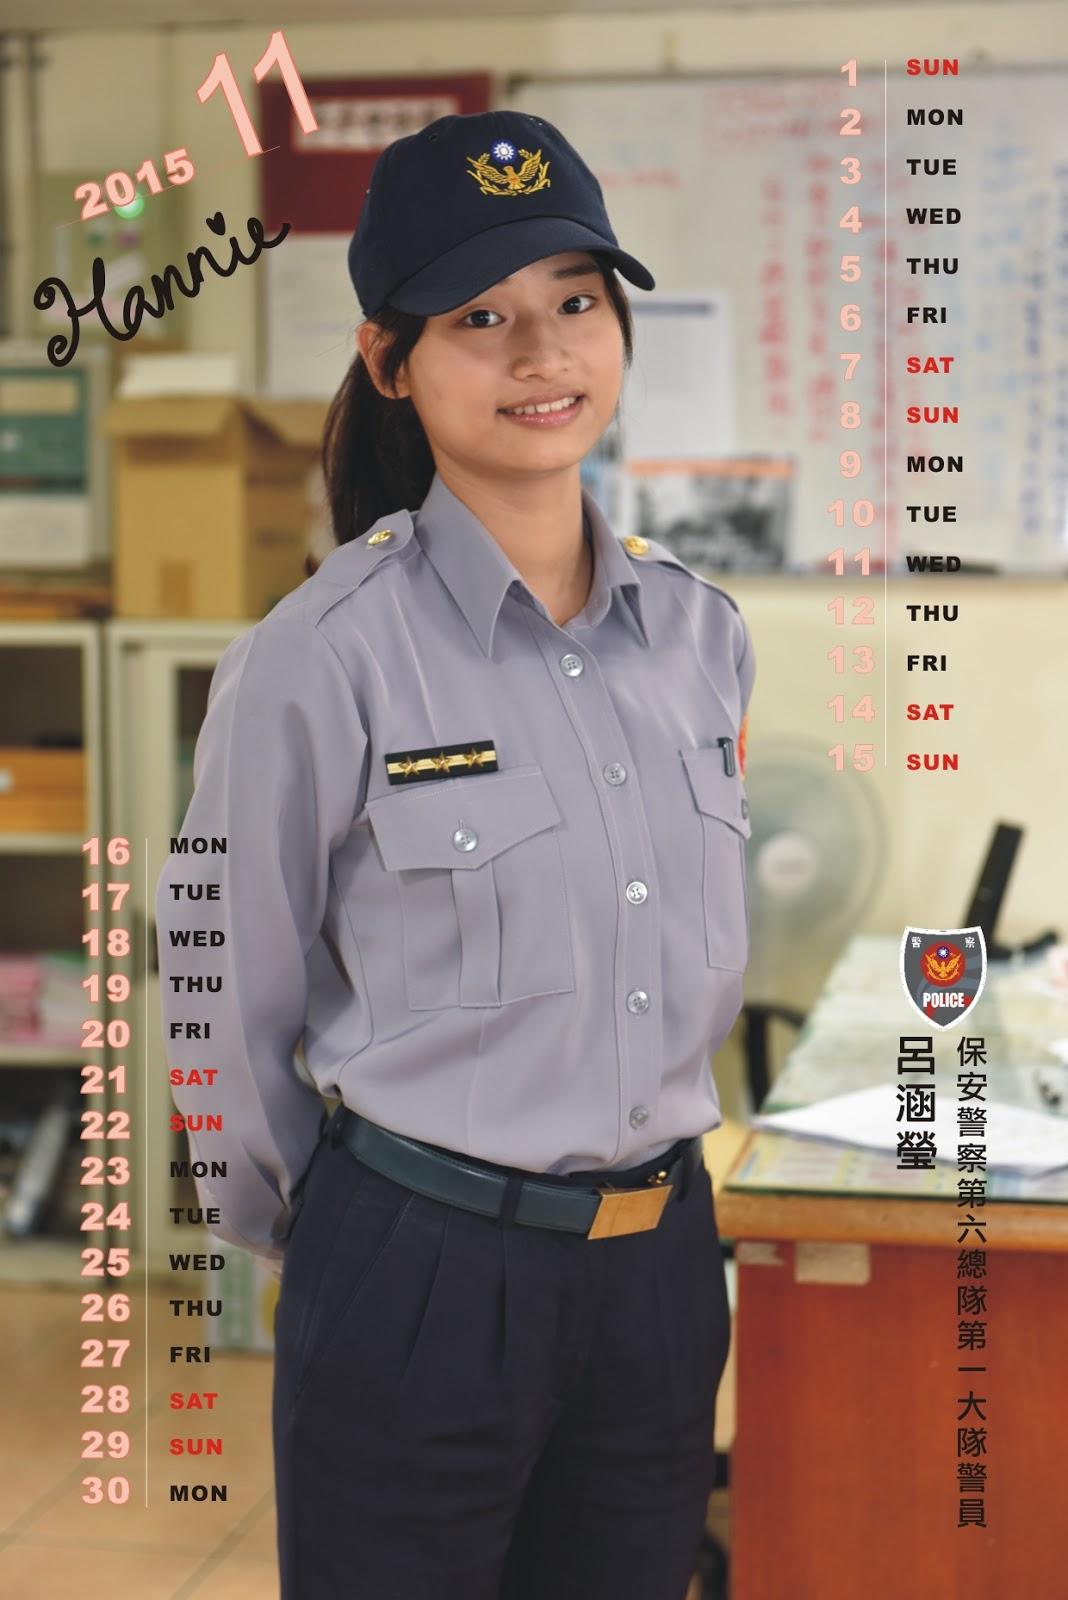 100 Police 警察故事百年傳承: 11月警光亮點@保安警察第六總隊第一大隊警員 呂涵瑩